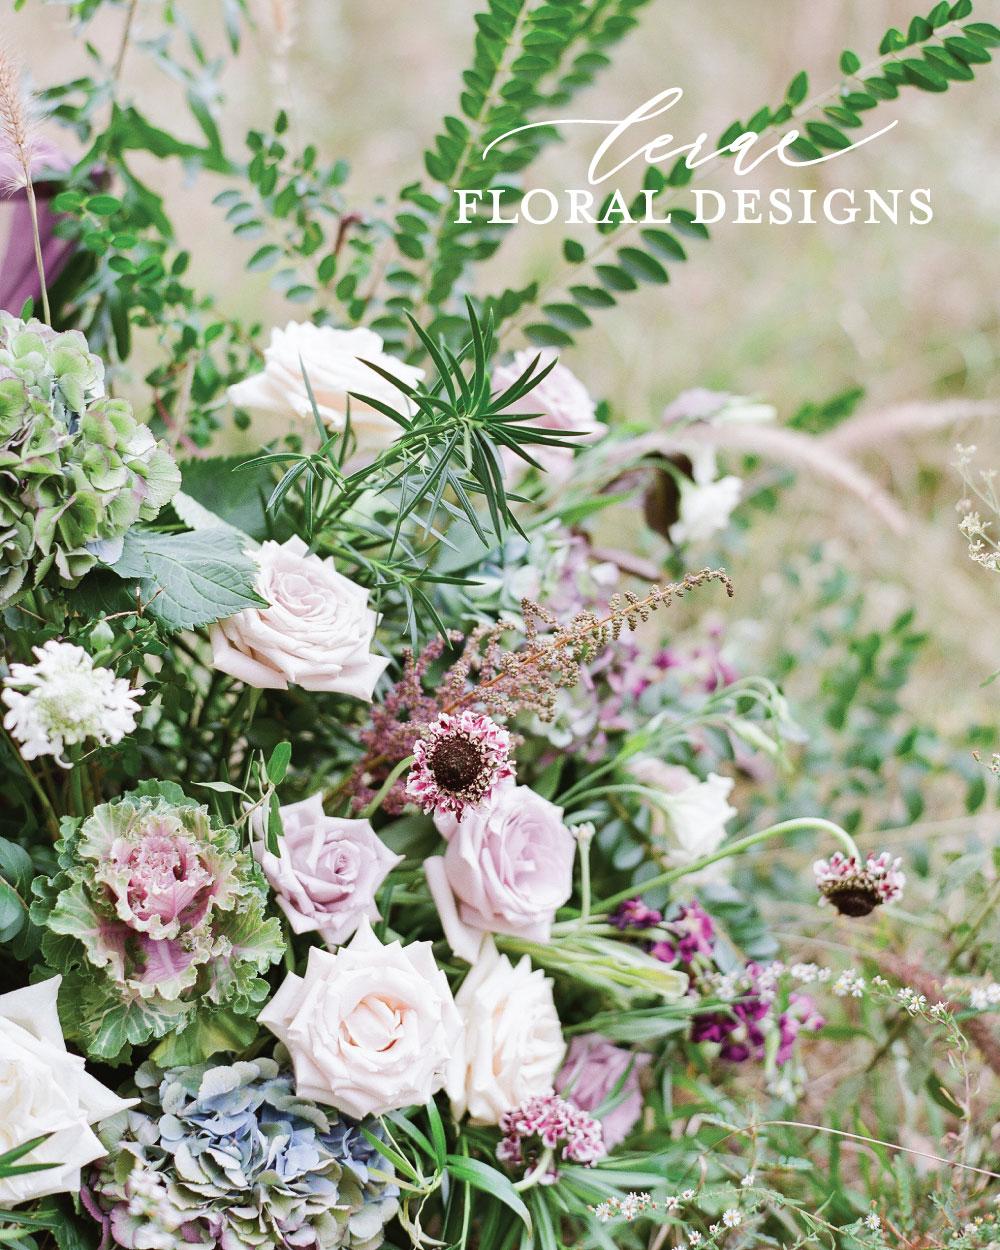 floraldesigns5.jpg